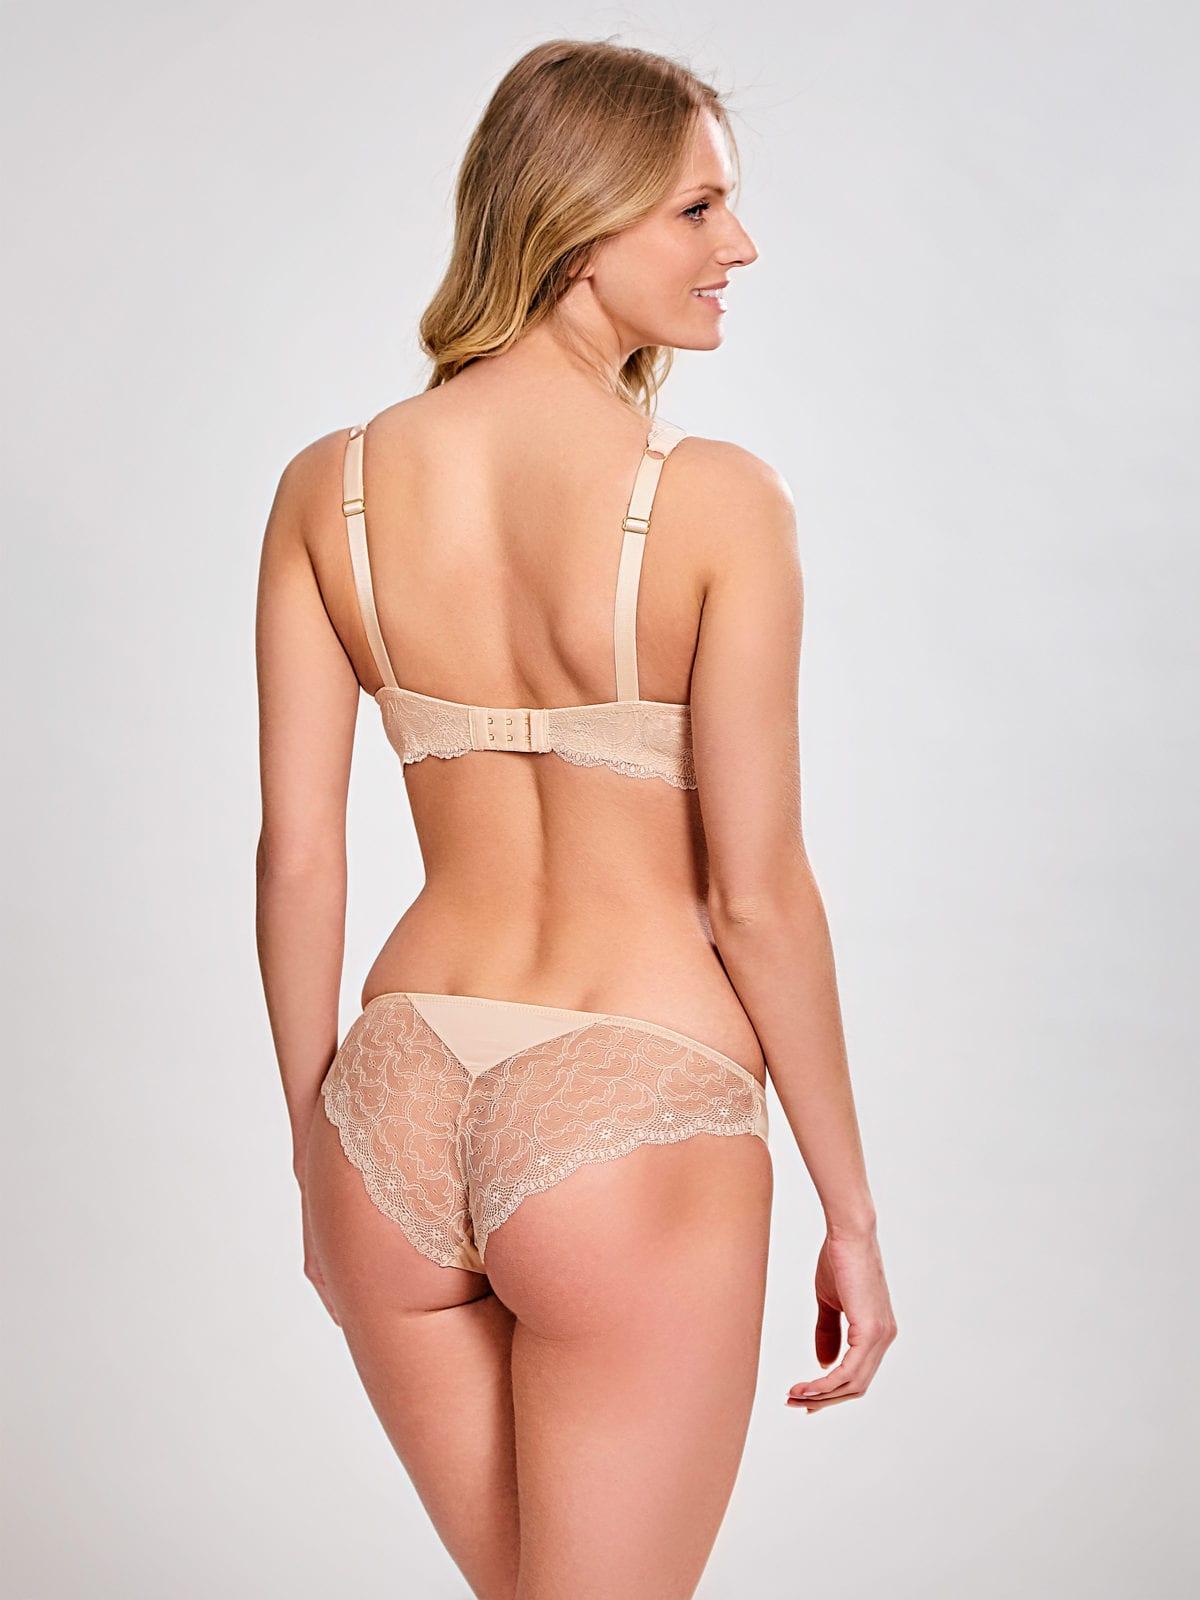 Бюстгальтеры 7951_208_Ardour Sweetheart Bra Nude Back Trade 4